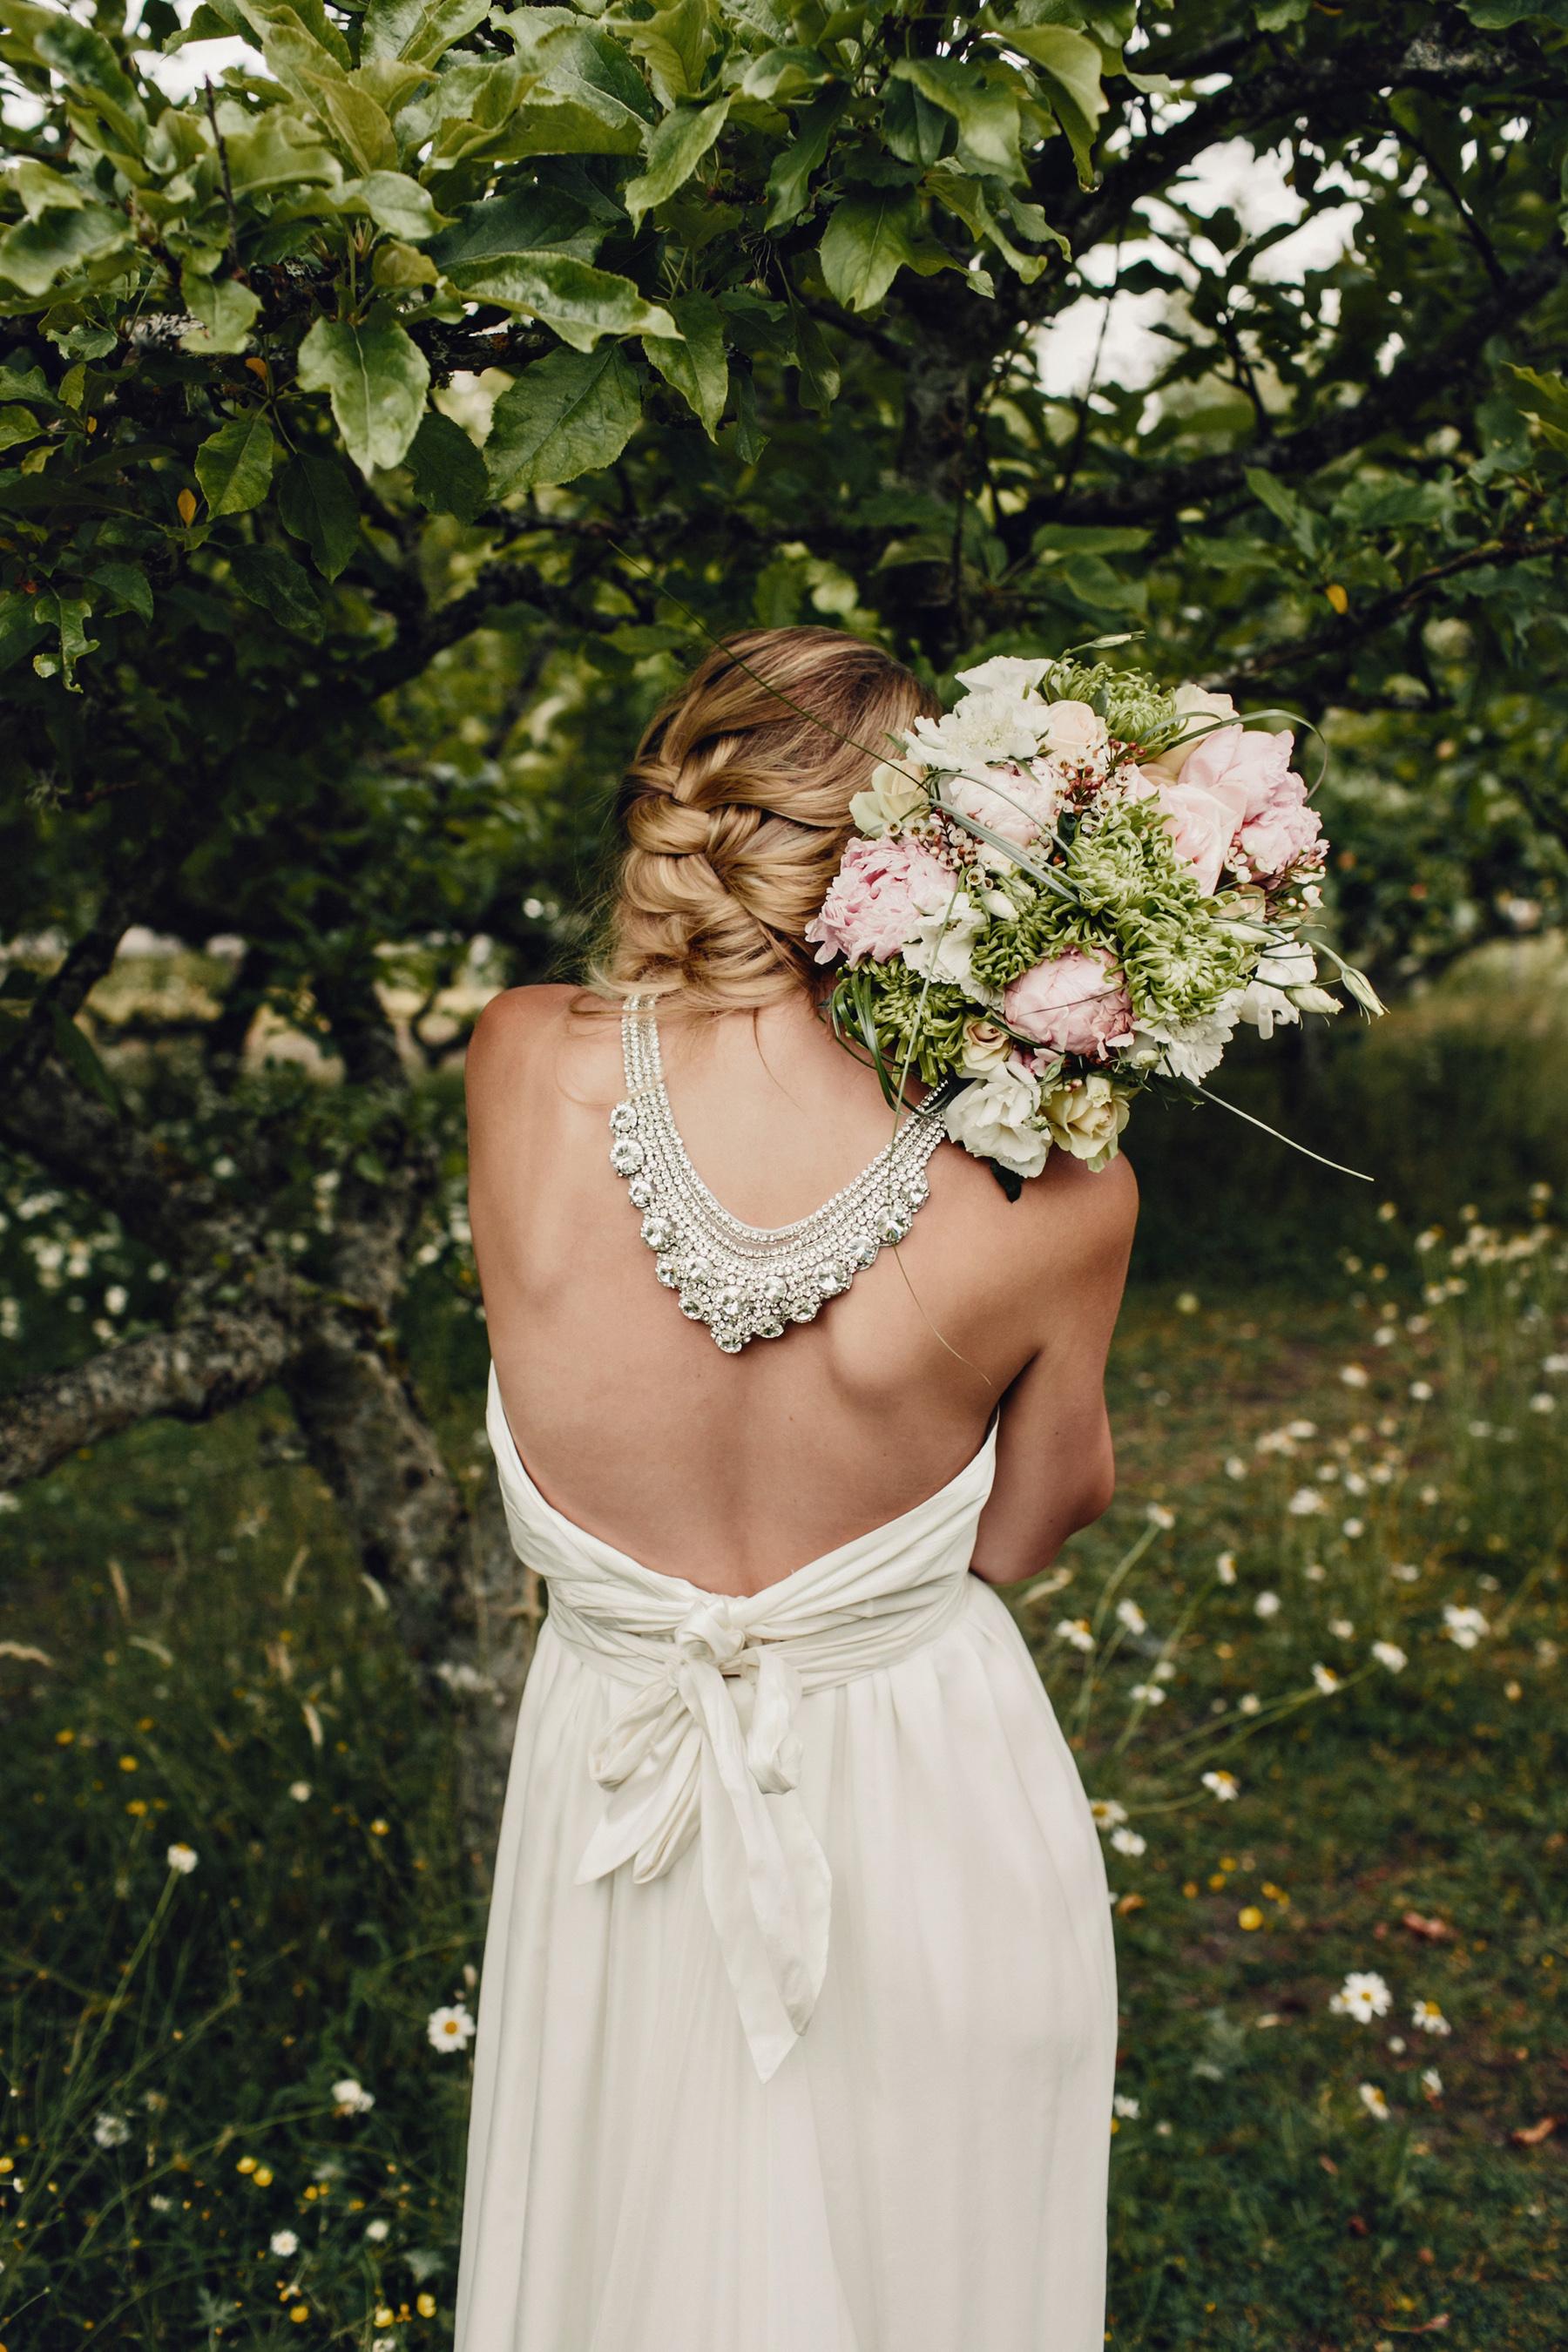 kildara-farms-wedding-photo-inspiration-0067